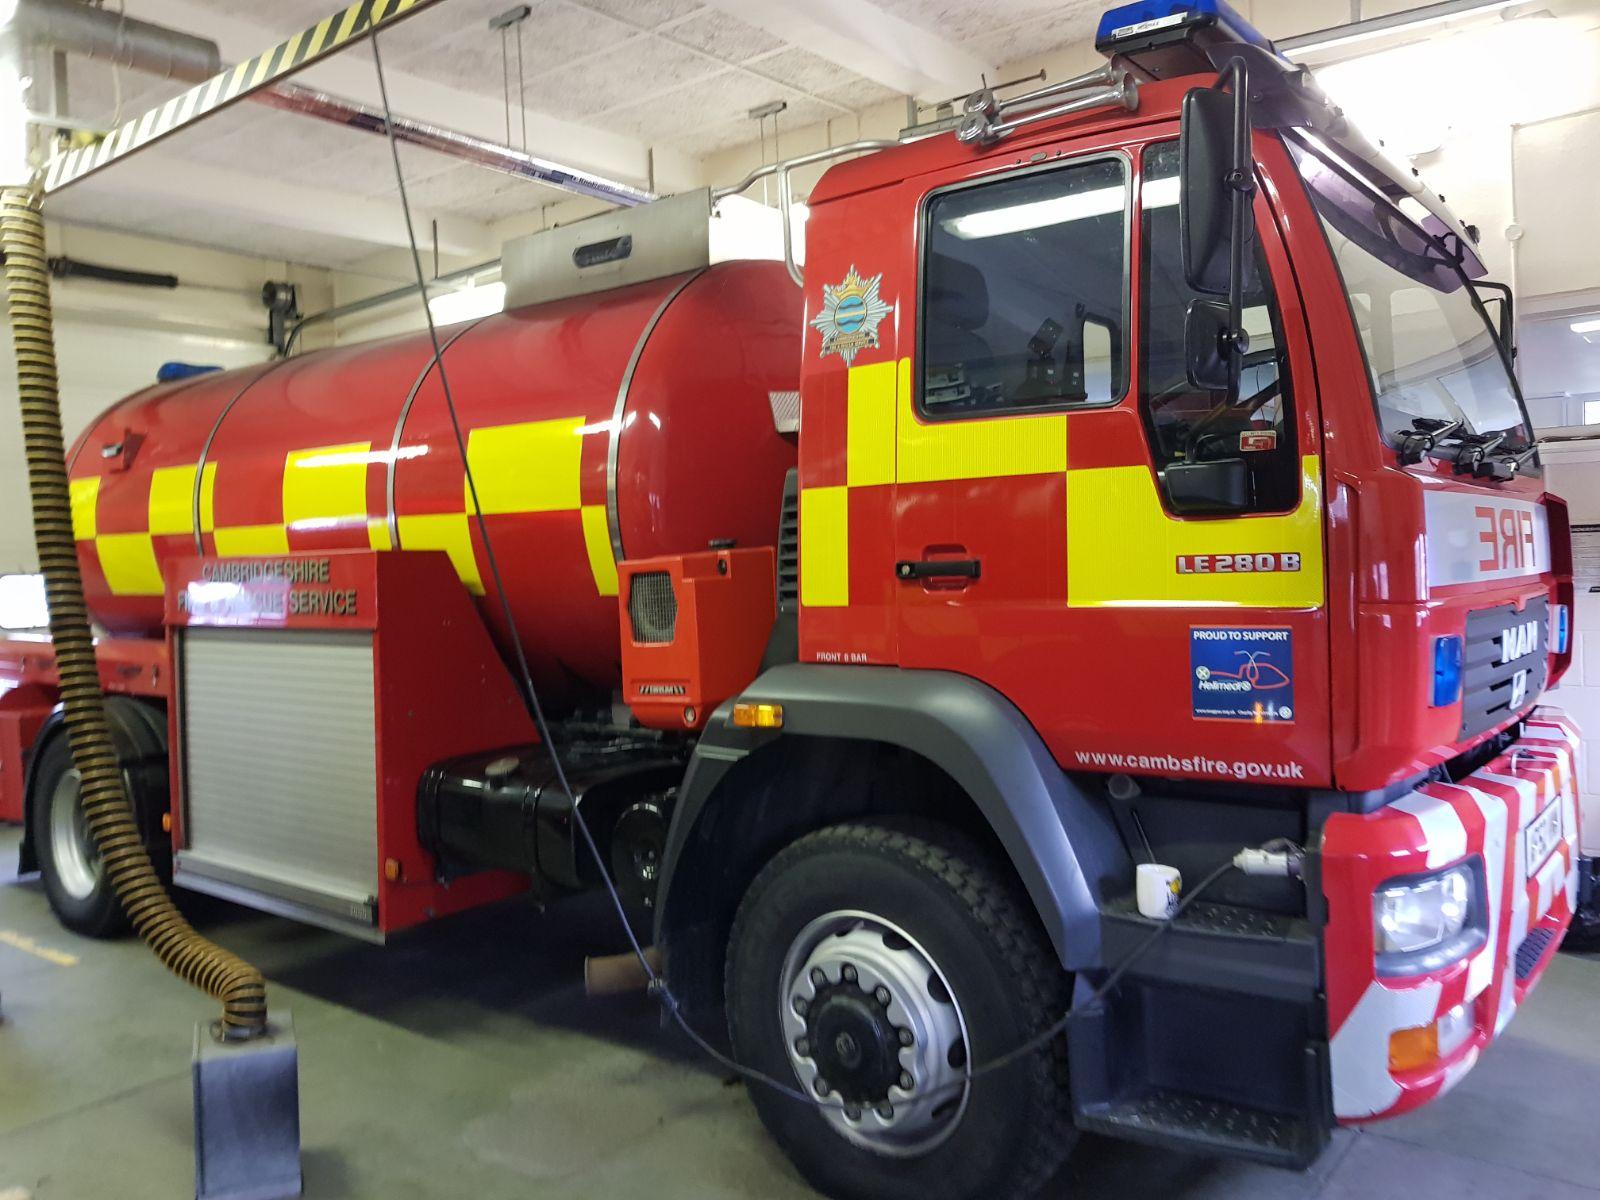 Emergency Services Vehicle CCTV